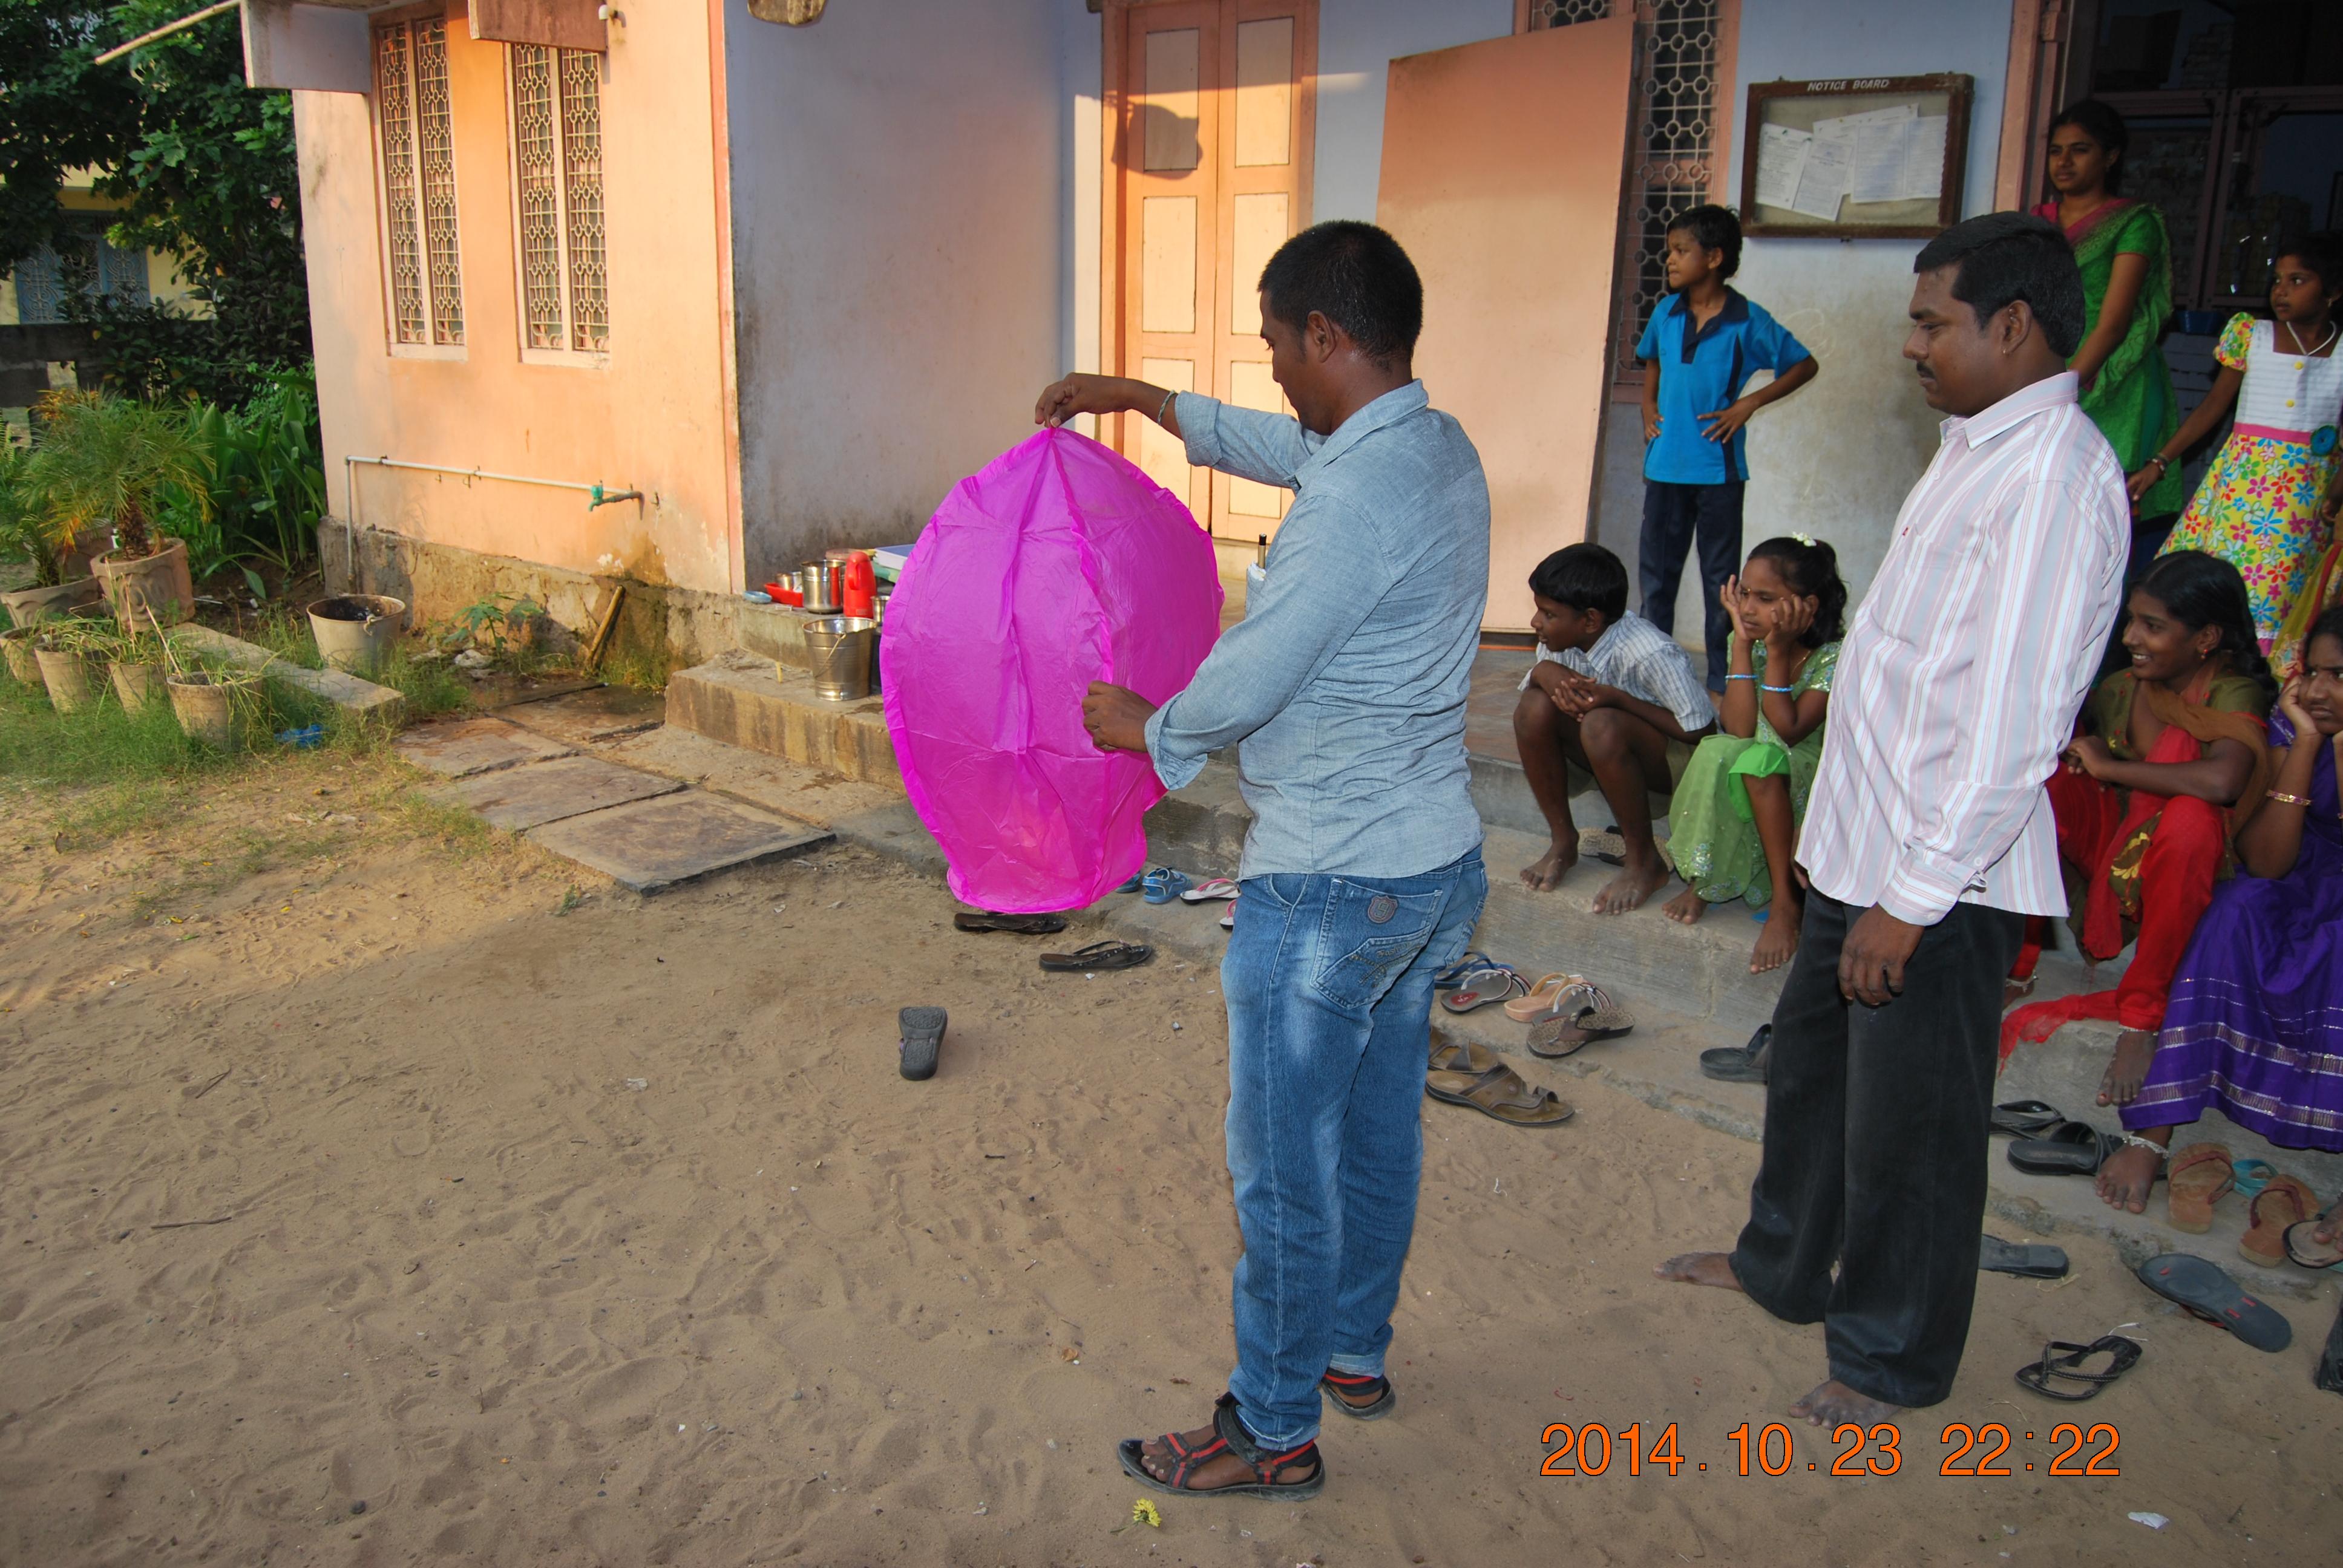 20141023 Diwali 3